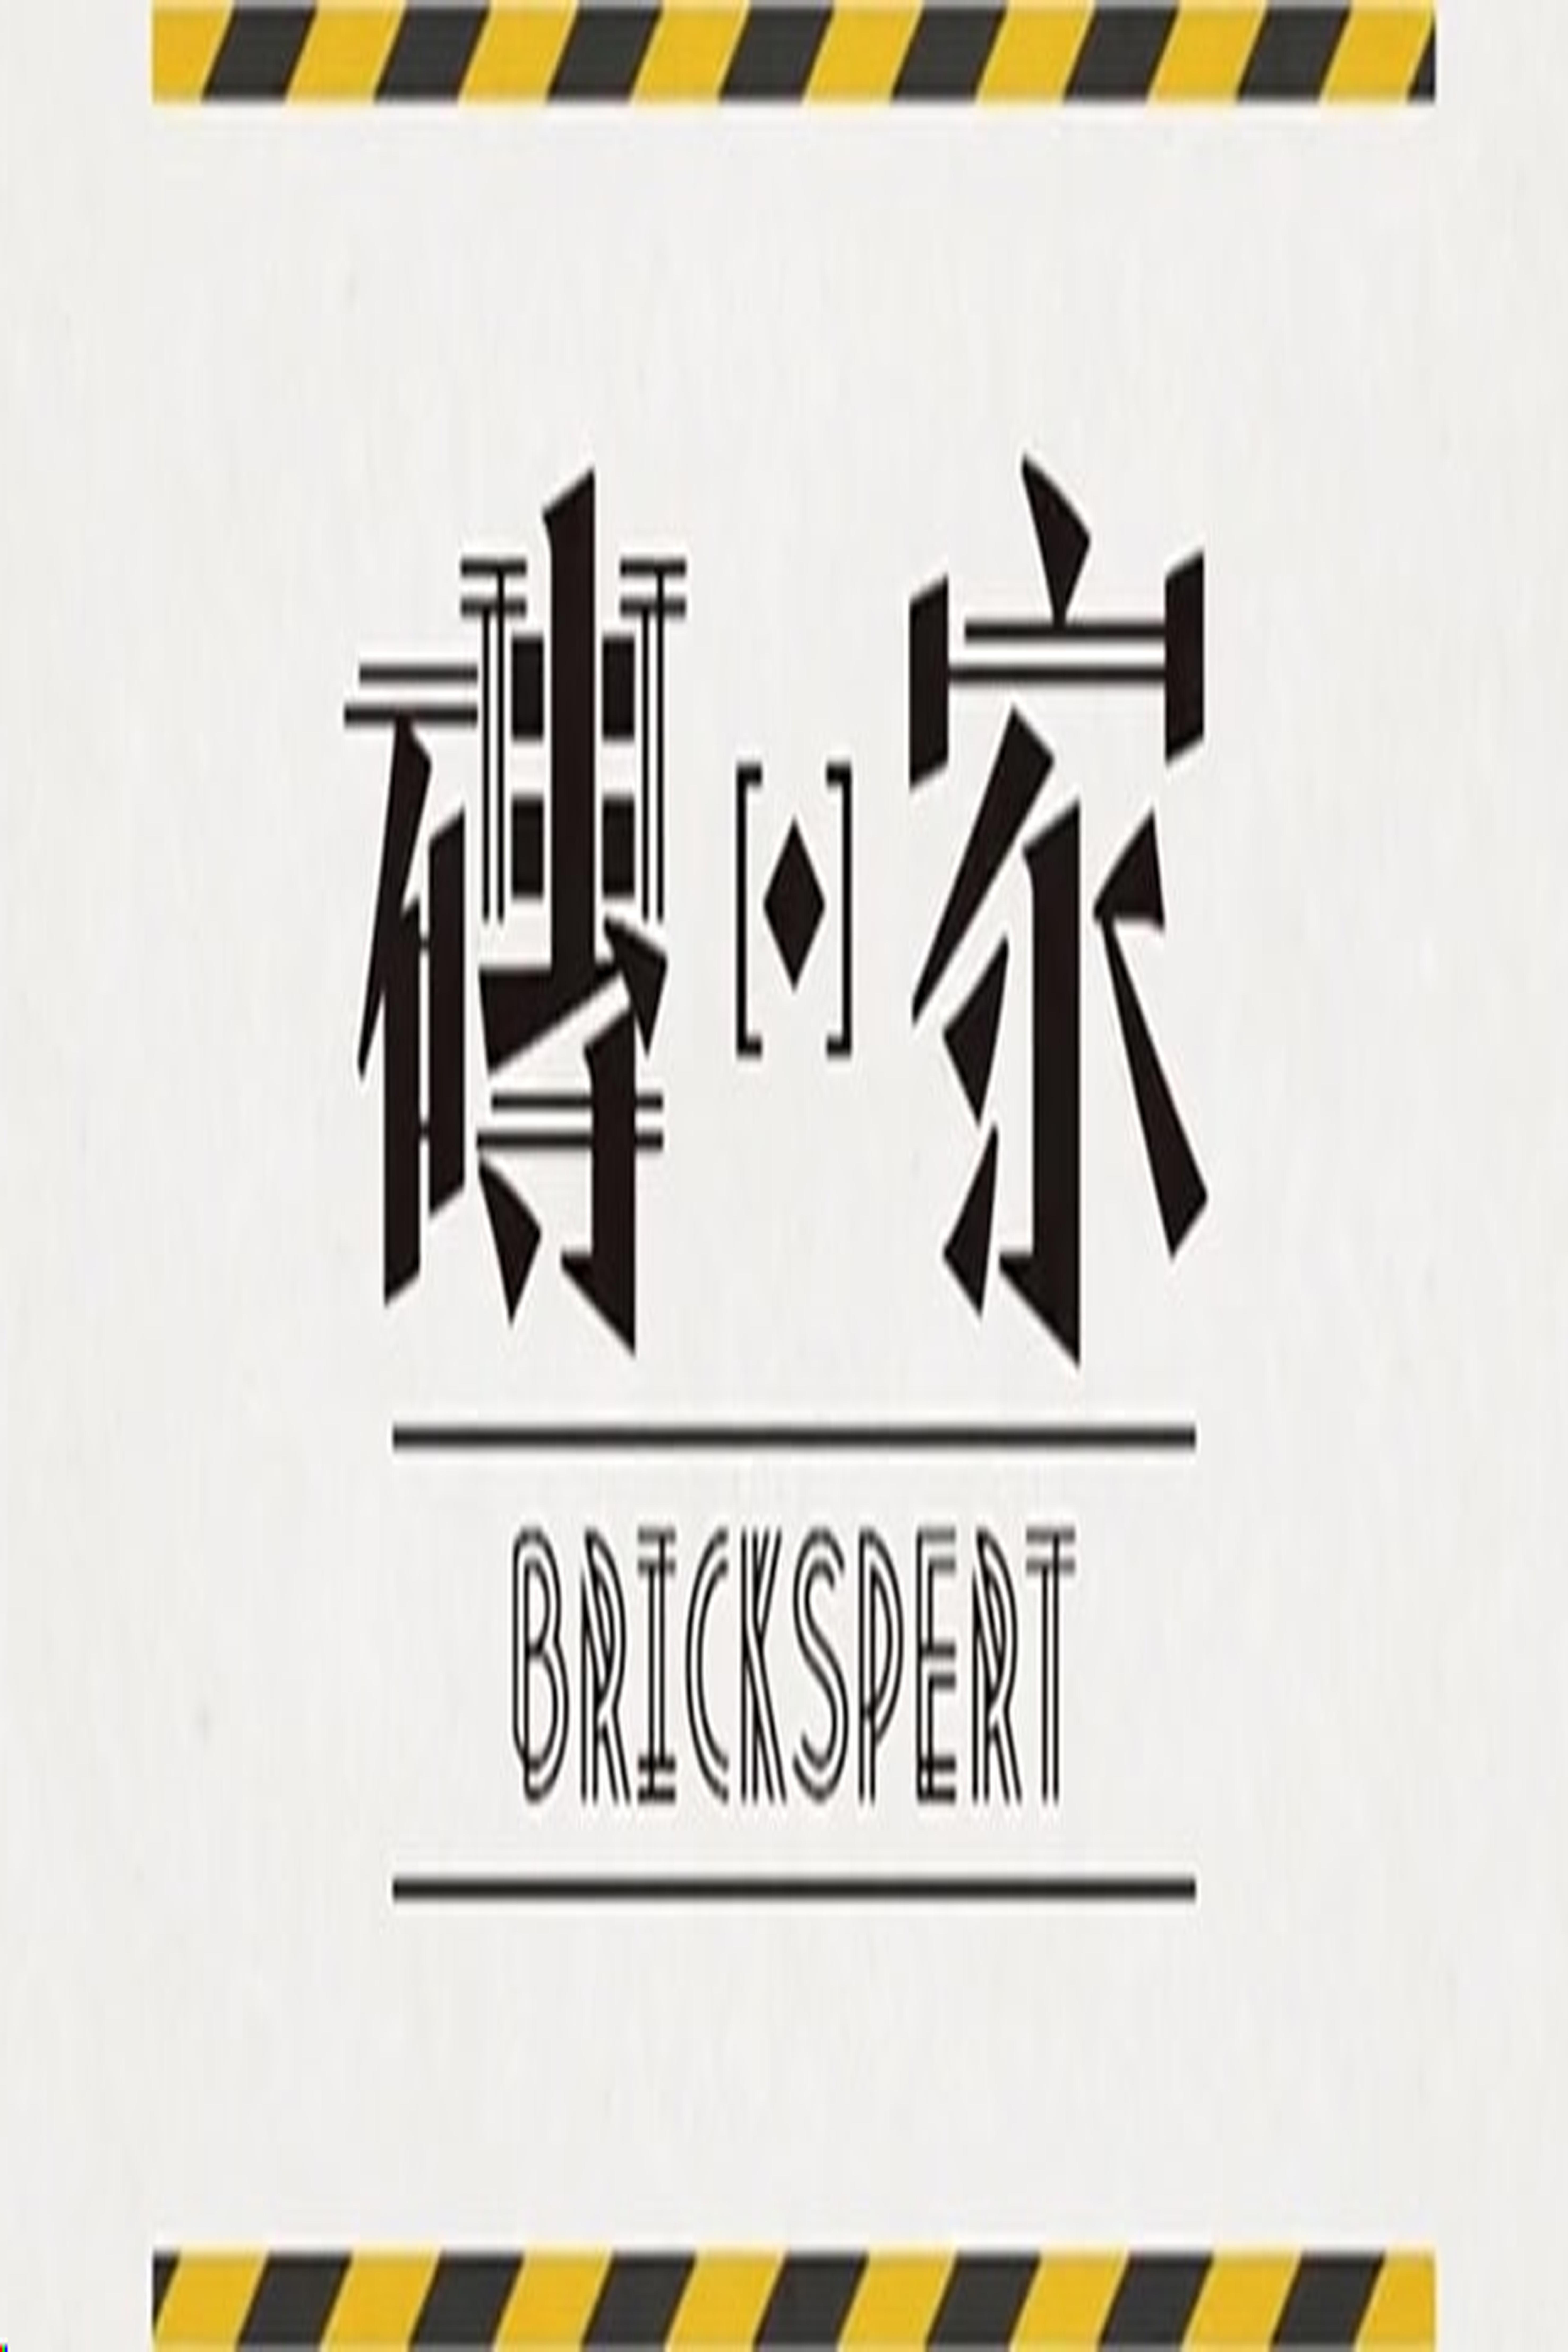 Brickspert S2 - 磚‧家 2